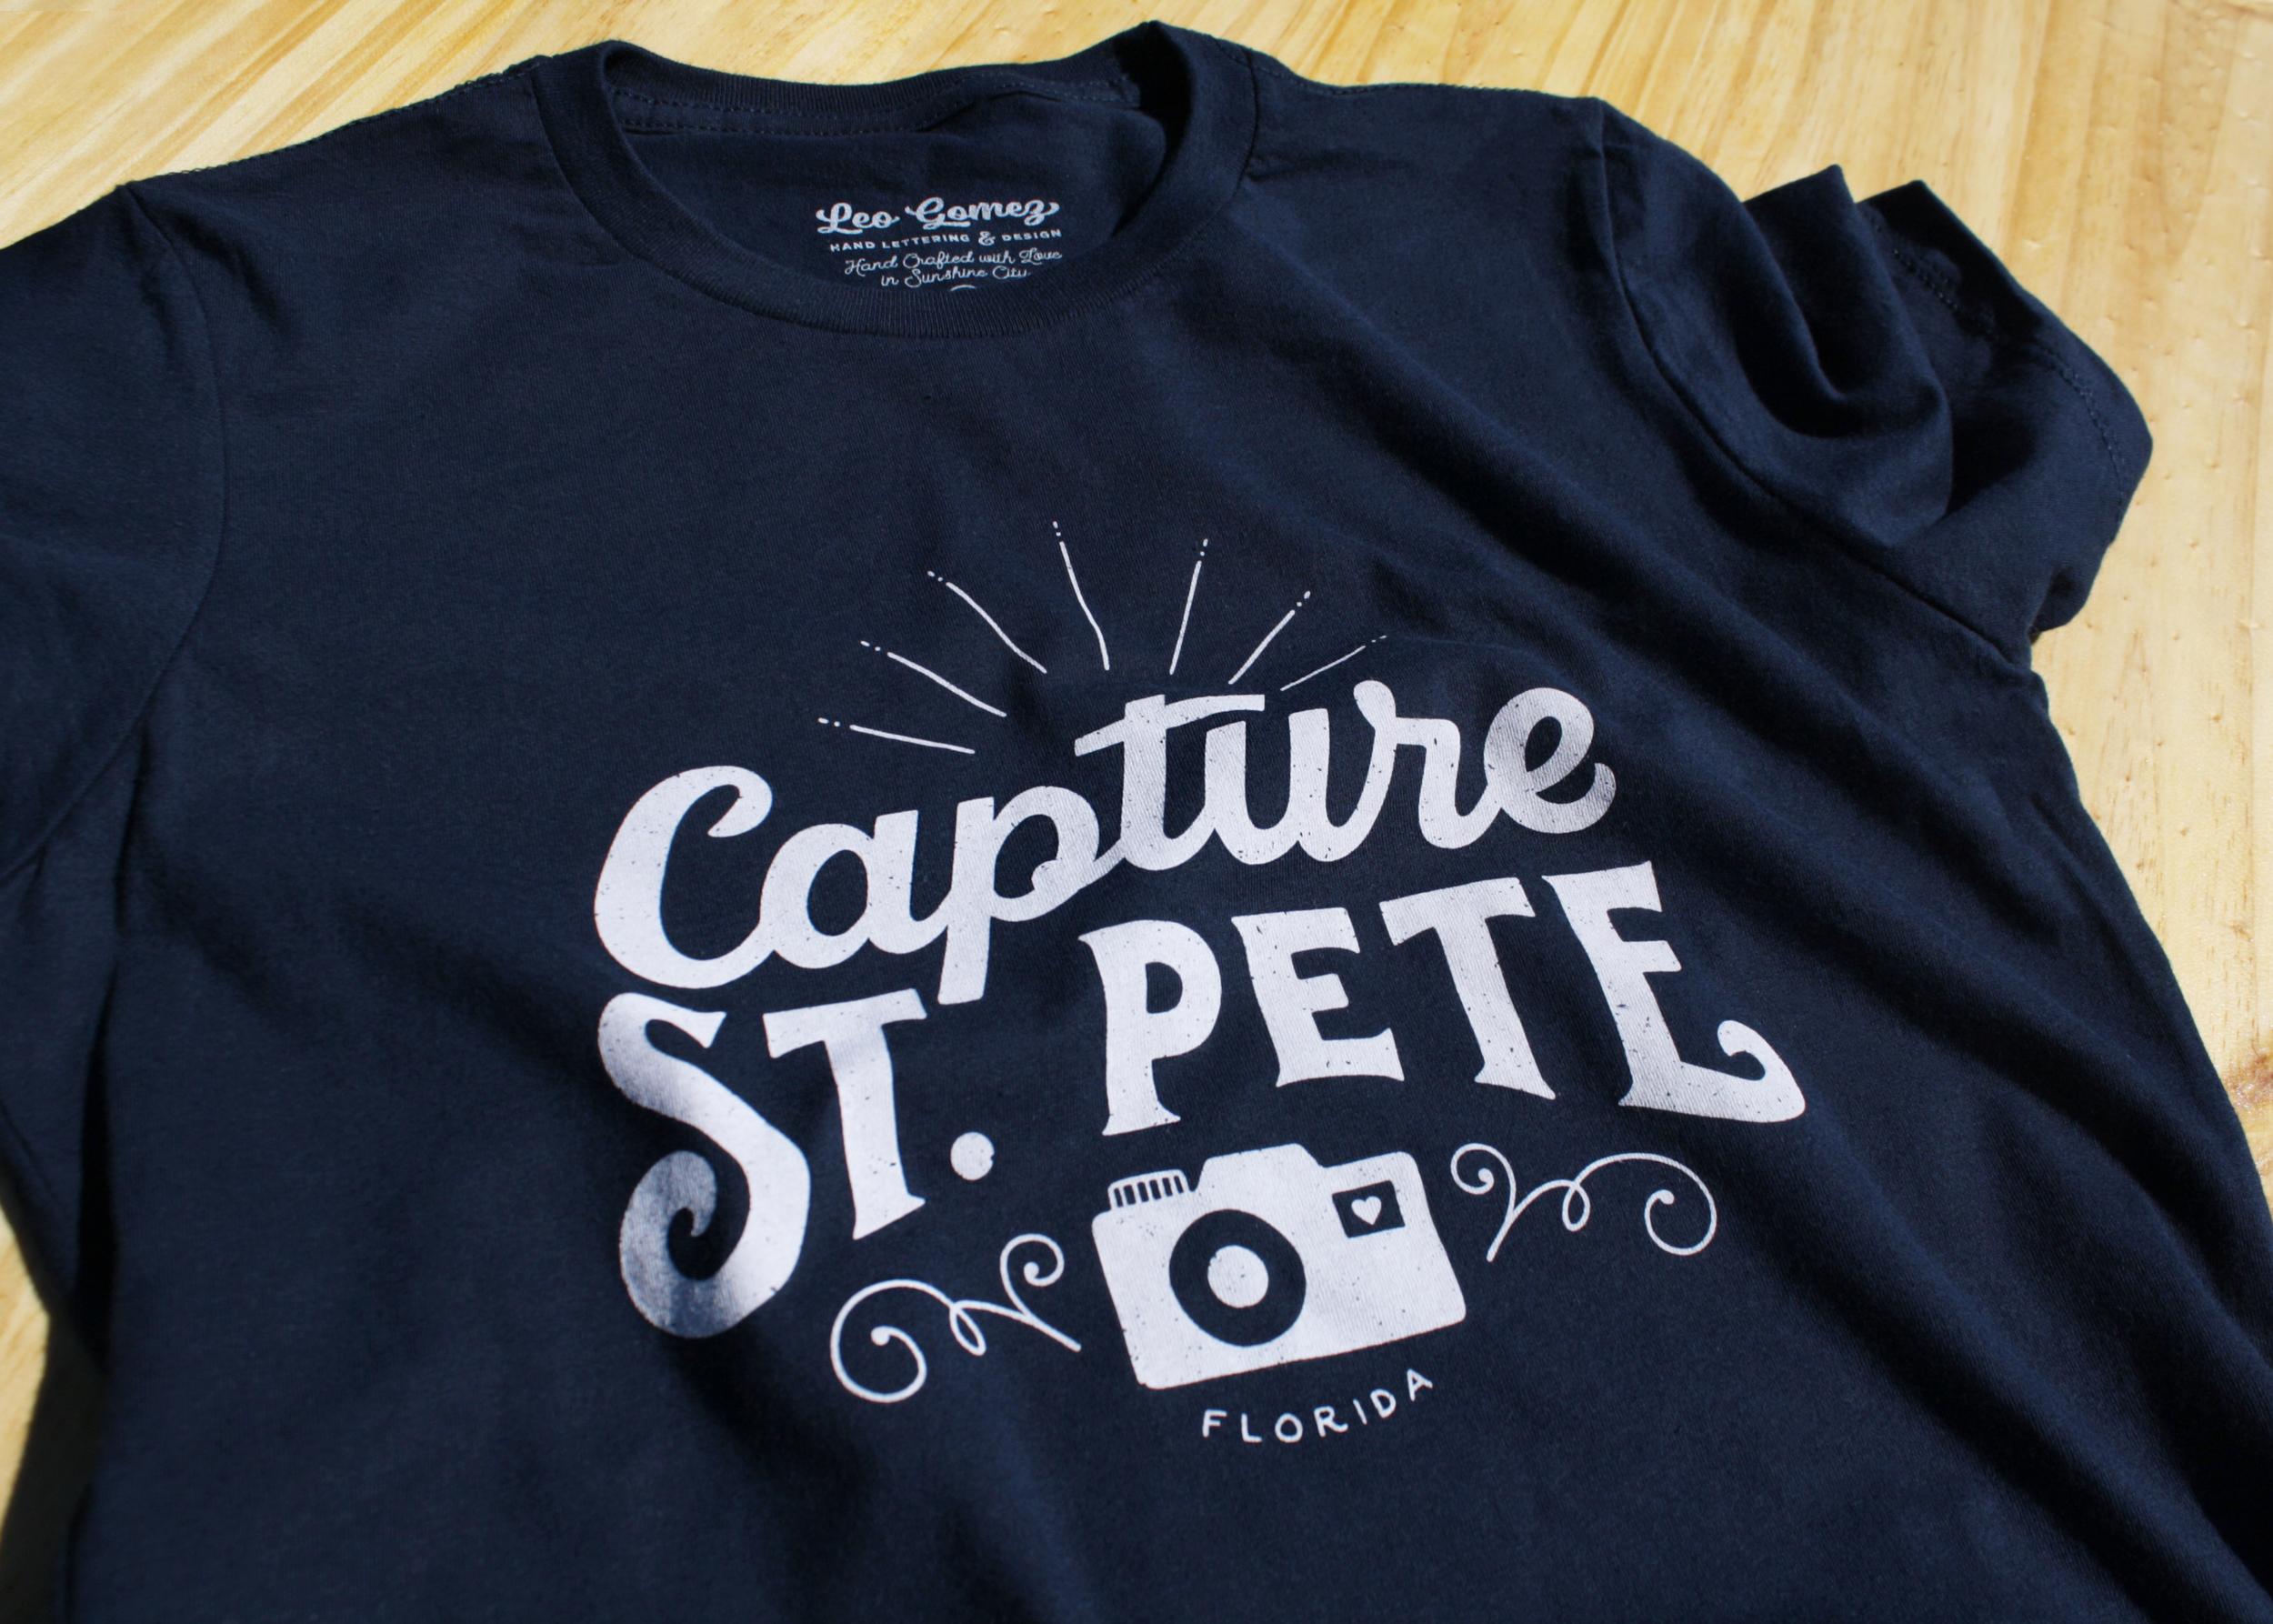 Leo-gomez-studio-capture-st-pete-tshirt-02